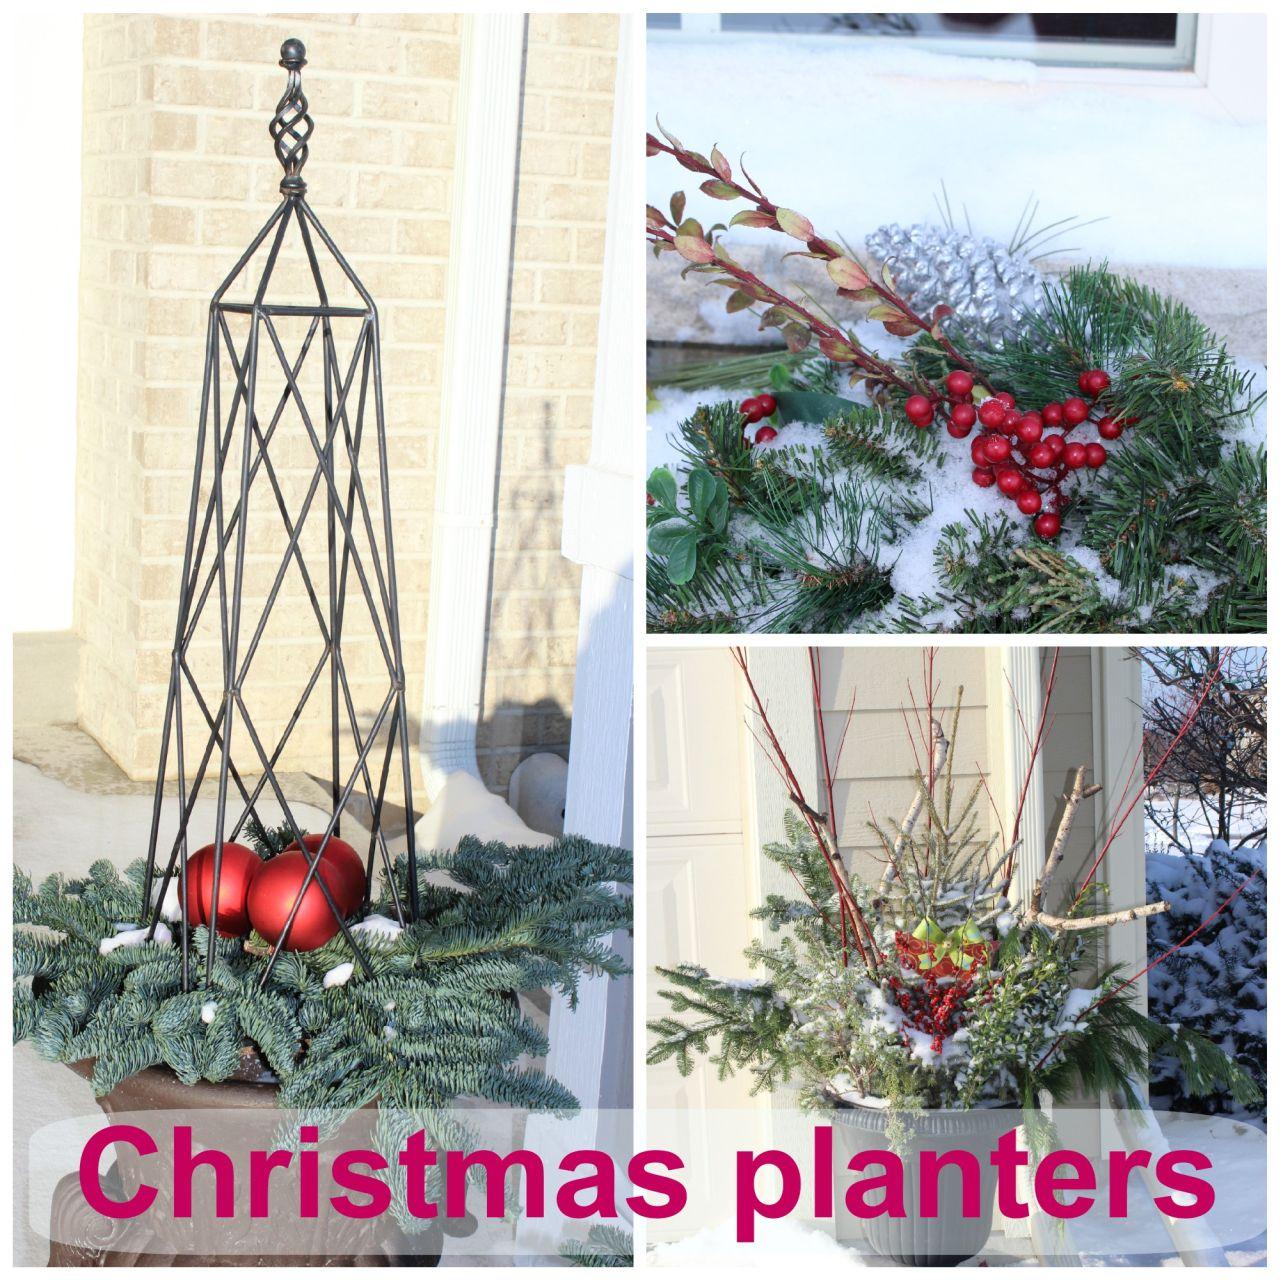 Christmas Planters & Window Boxes.